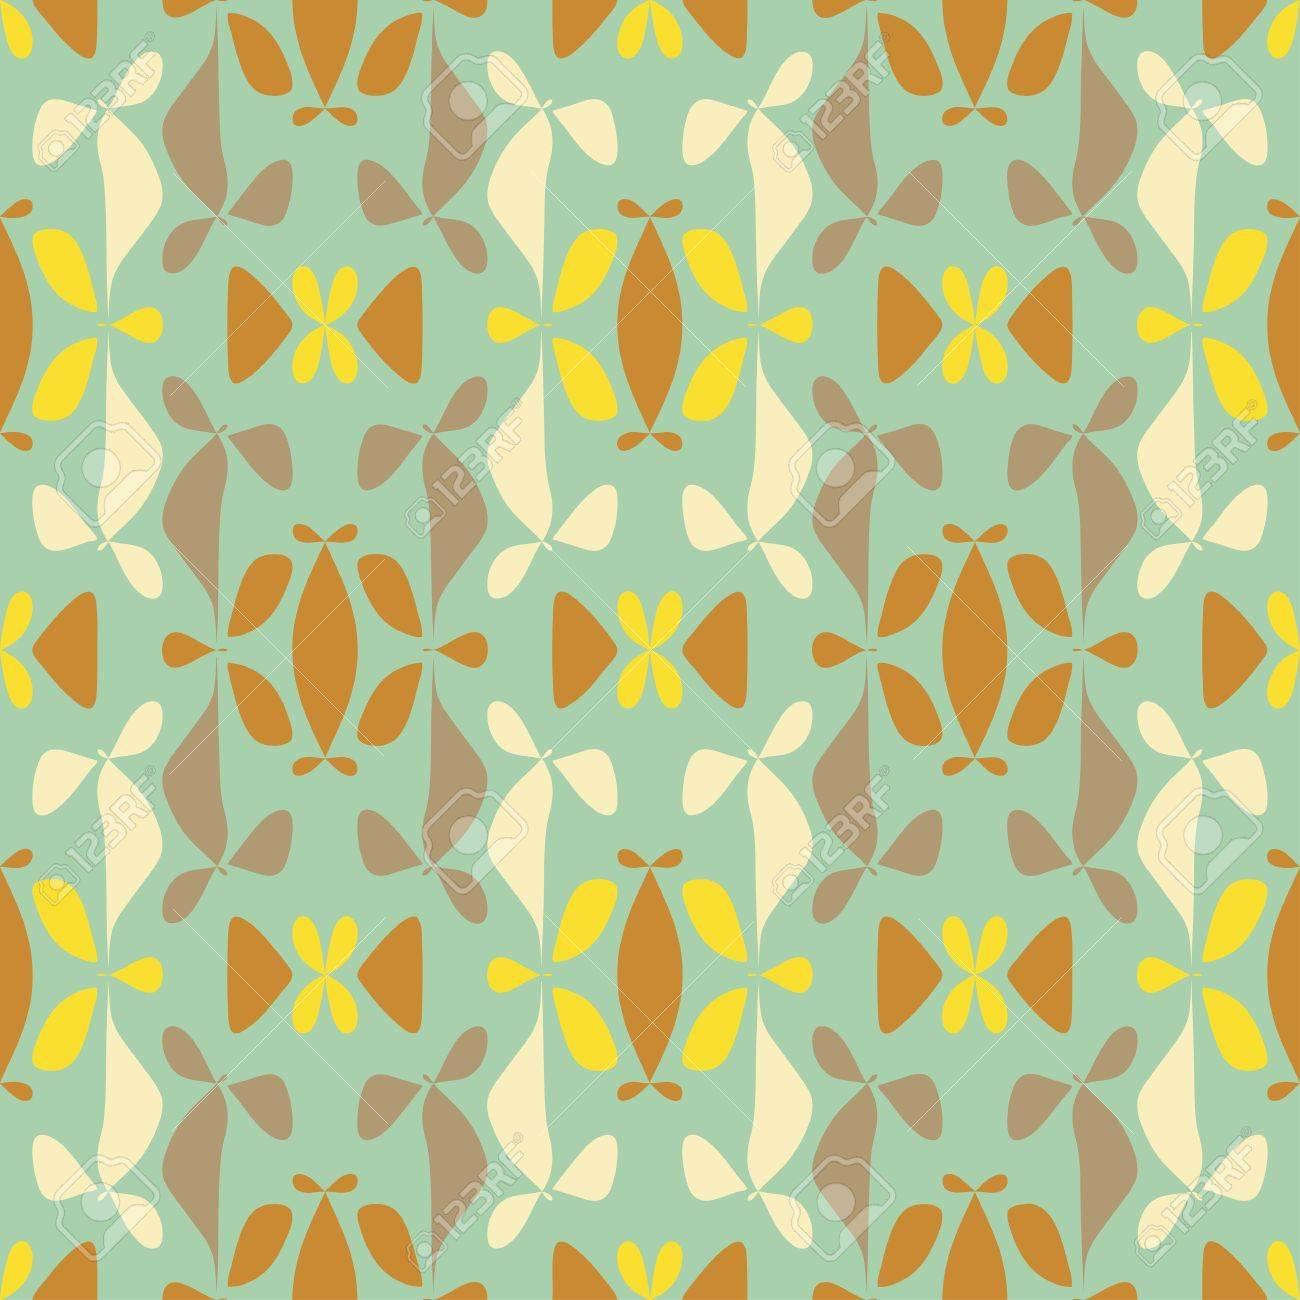 Garden flower bed ornament  Seamless pattern  Vector Stock Vector - 19867709